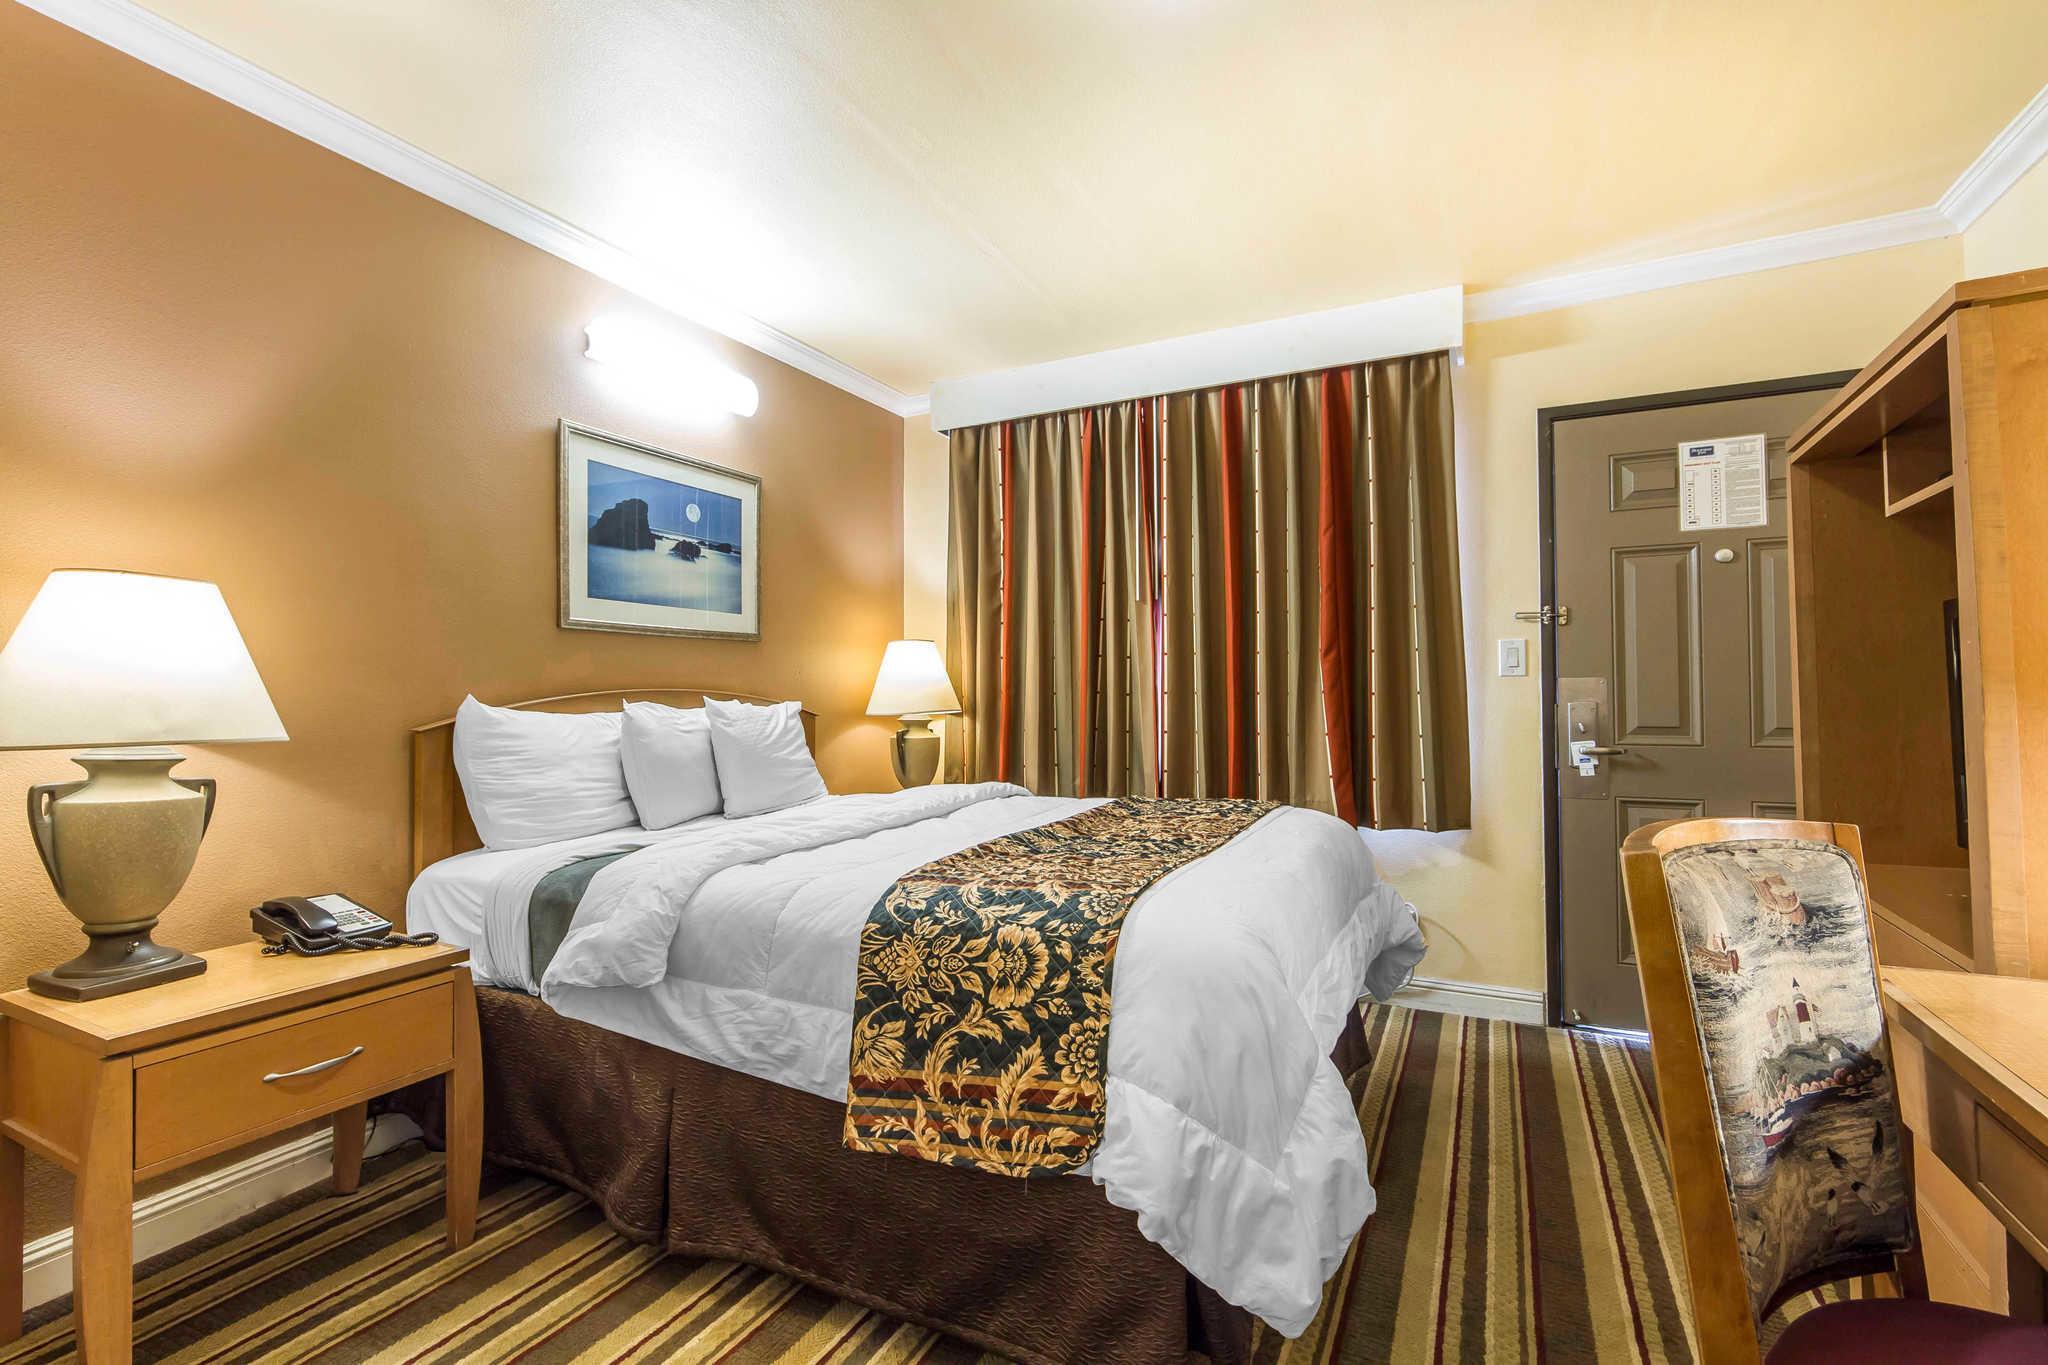 Hotel Rooms Near Oakland Coliseum